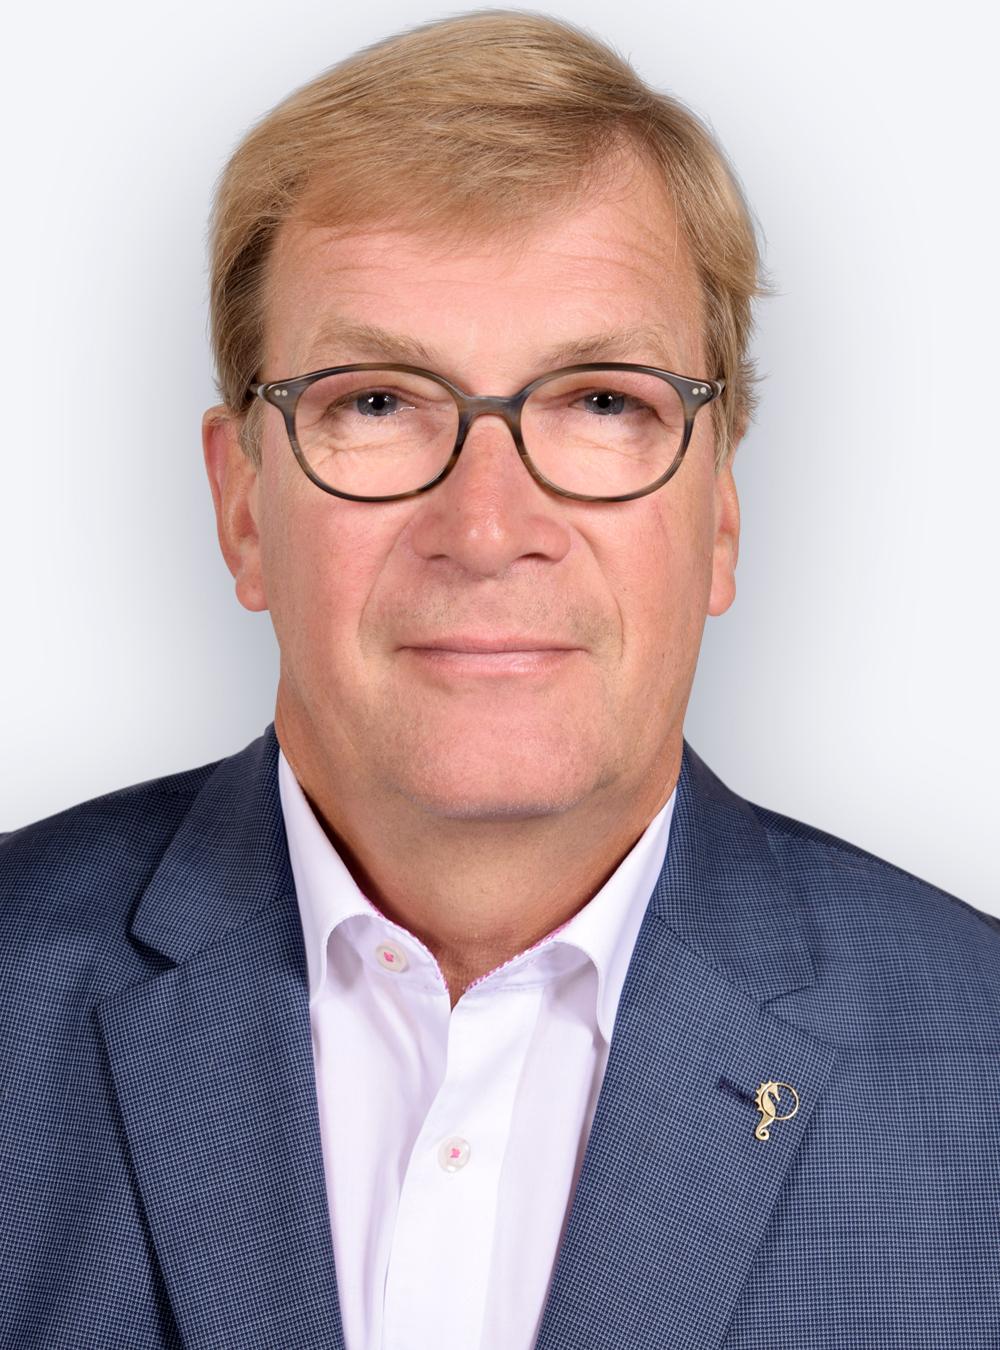 Frank Theunissen